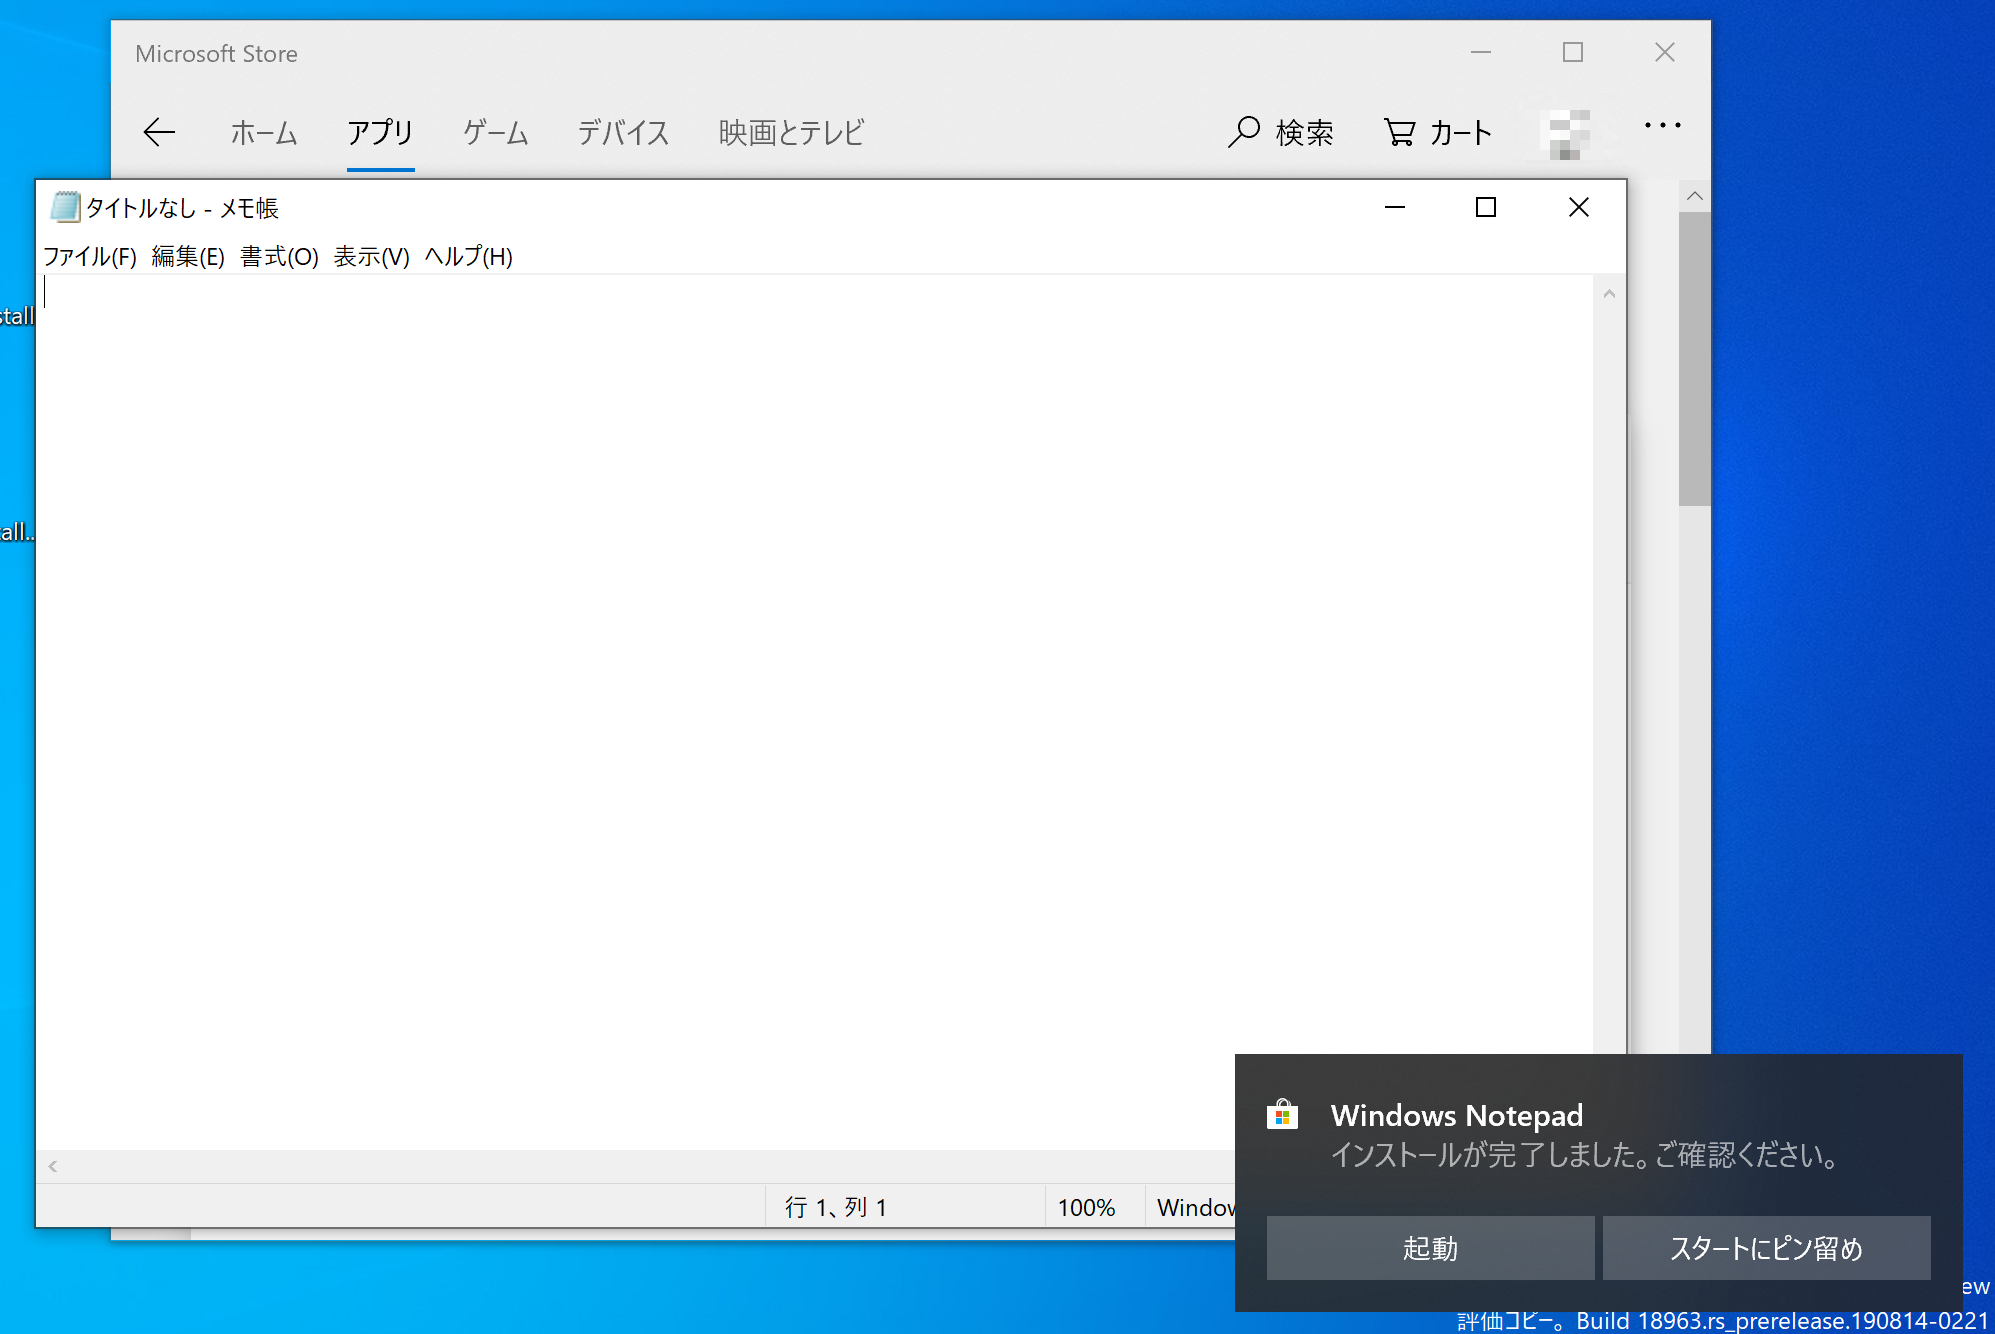 """Microsoft Store""からインストールした「メモ帳」"